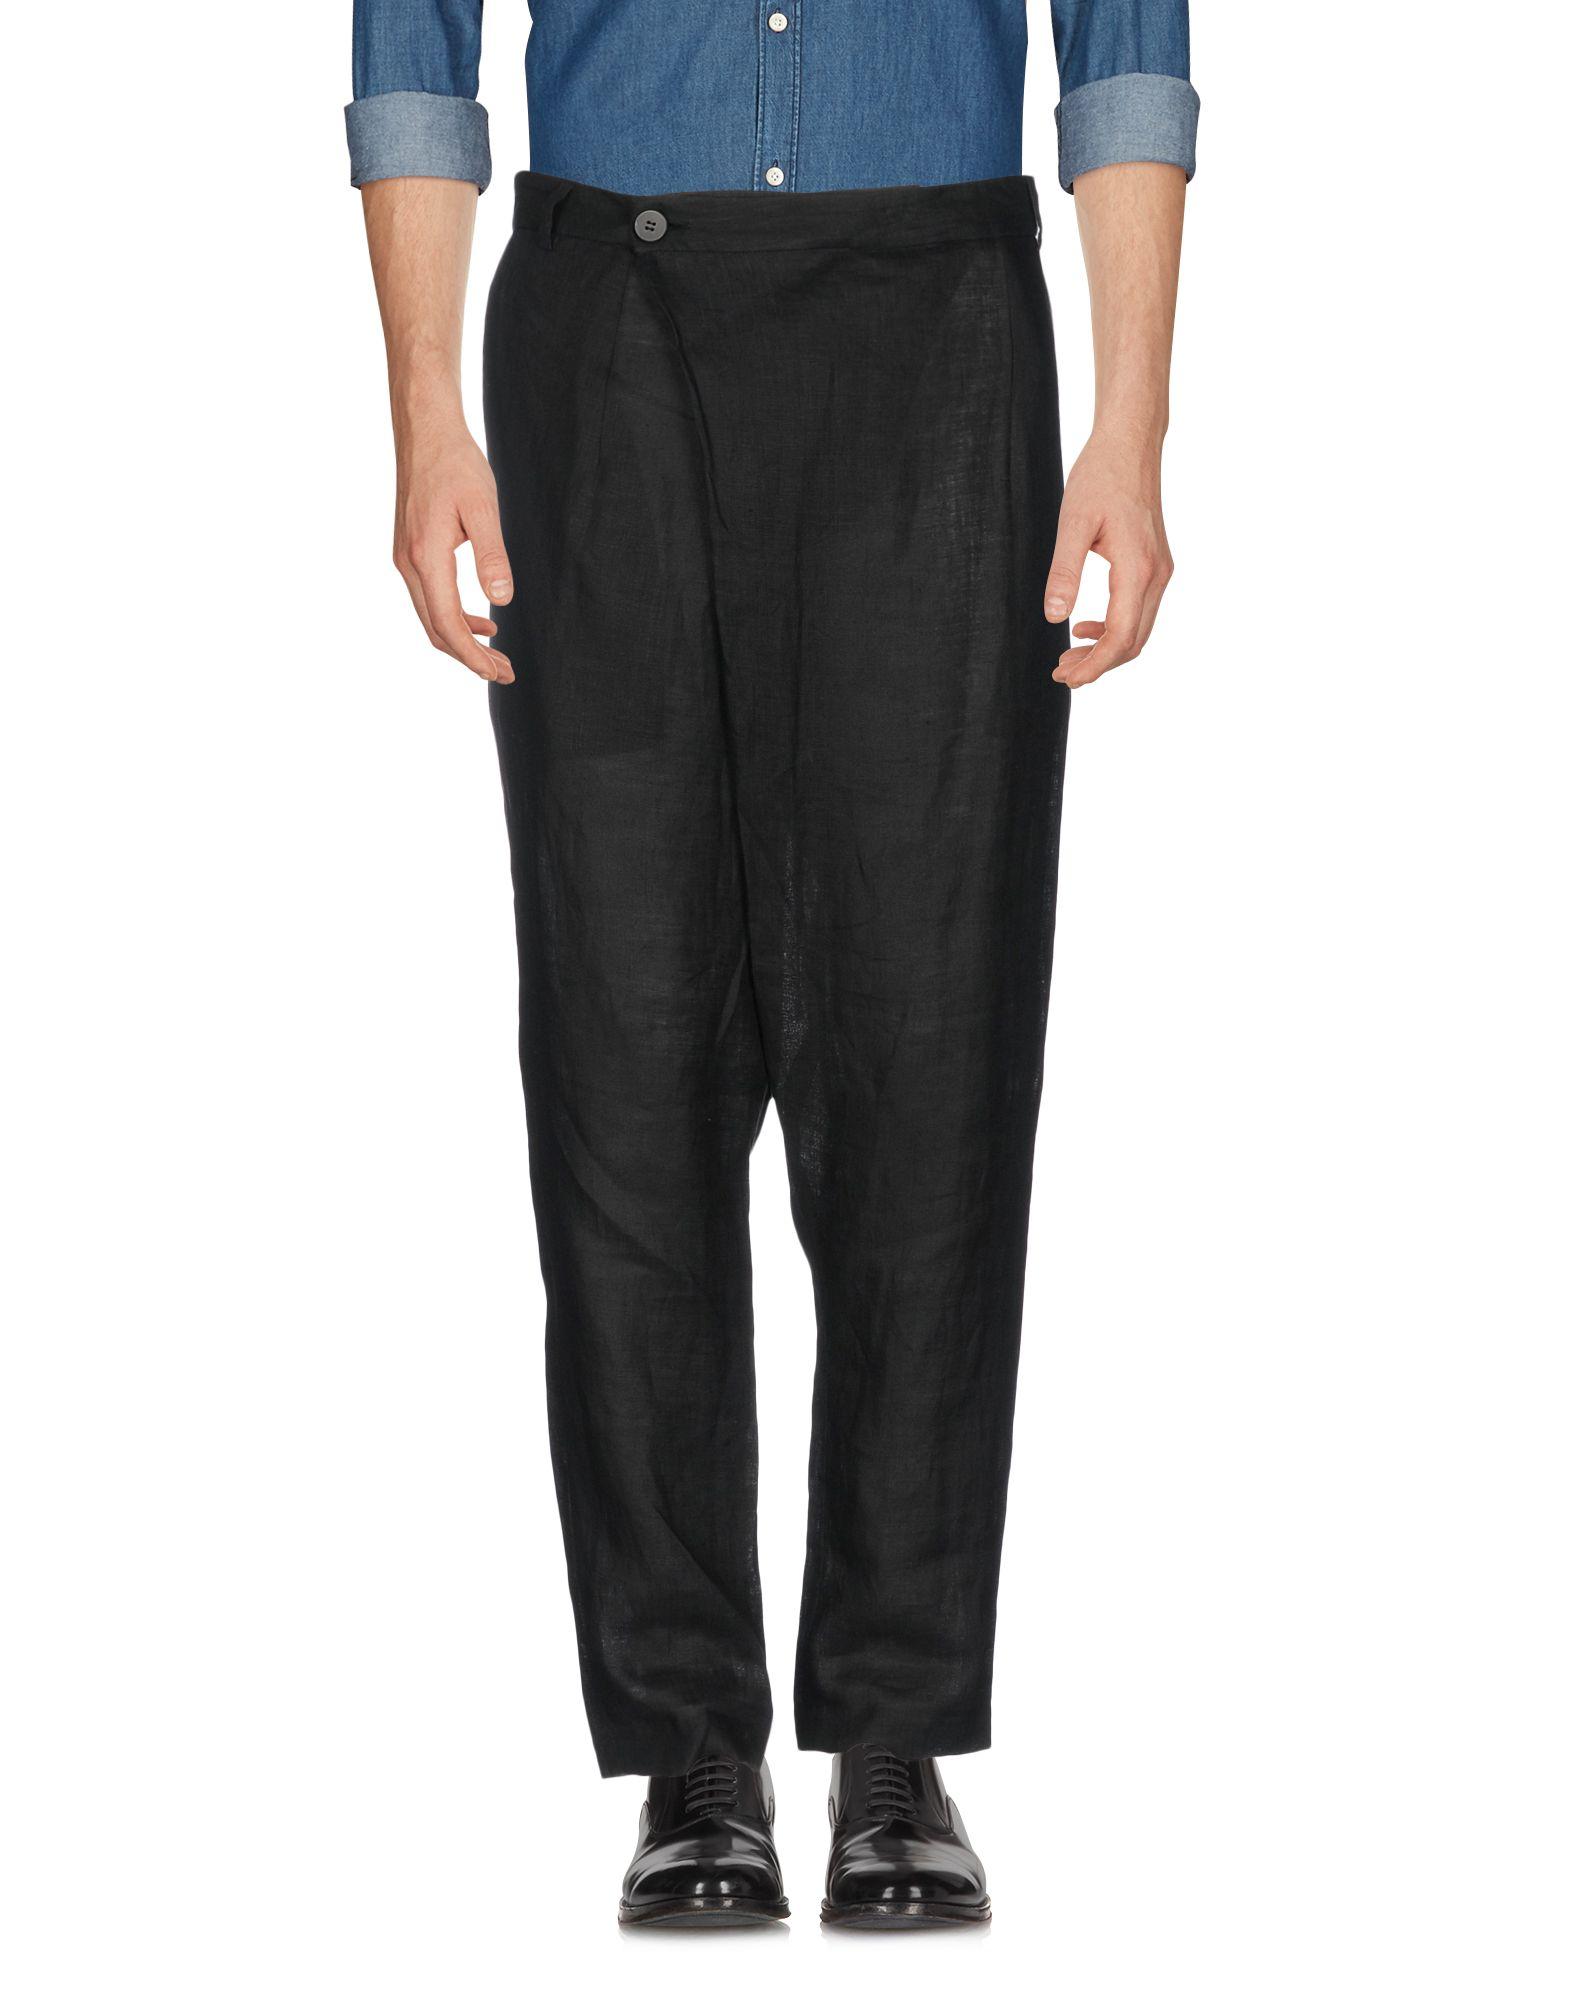 Pantalone Isabel Benenato Uomo - Acquista online su